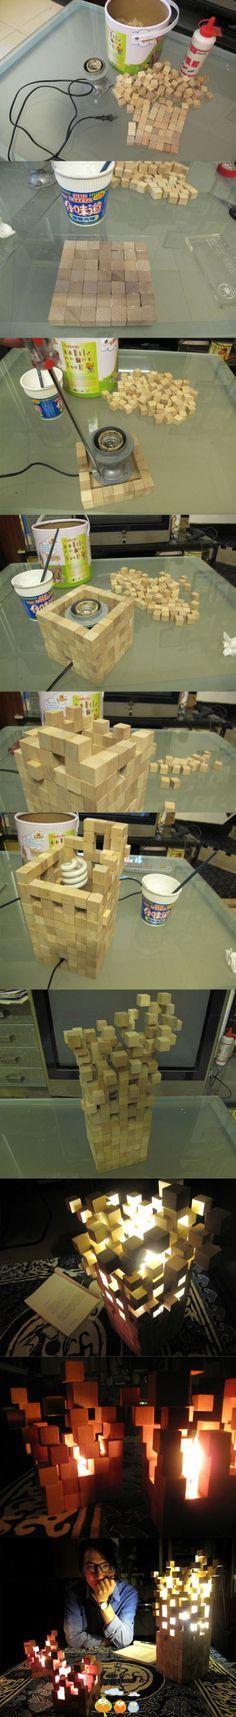 idea, diy crafts, teen rooms, cubes, creativ lamp, wooden blocks, the block, lincoln logs, kid